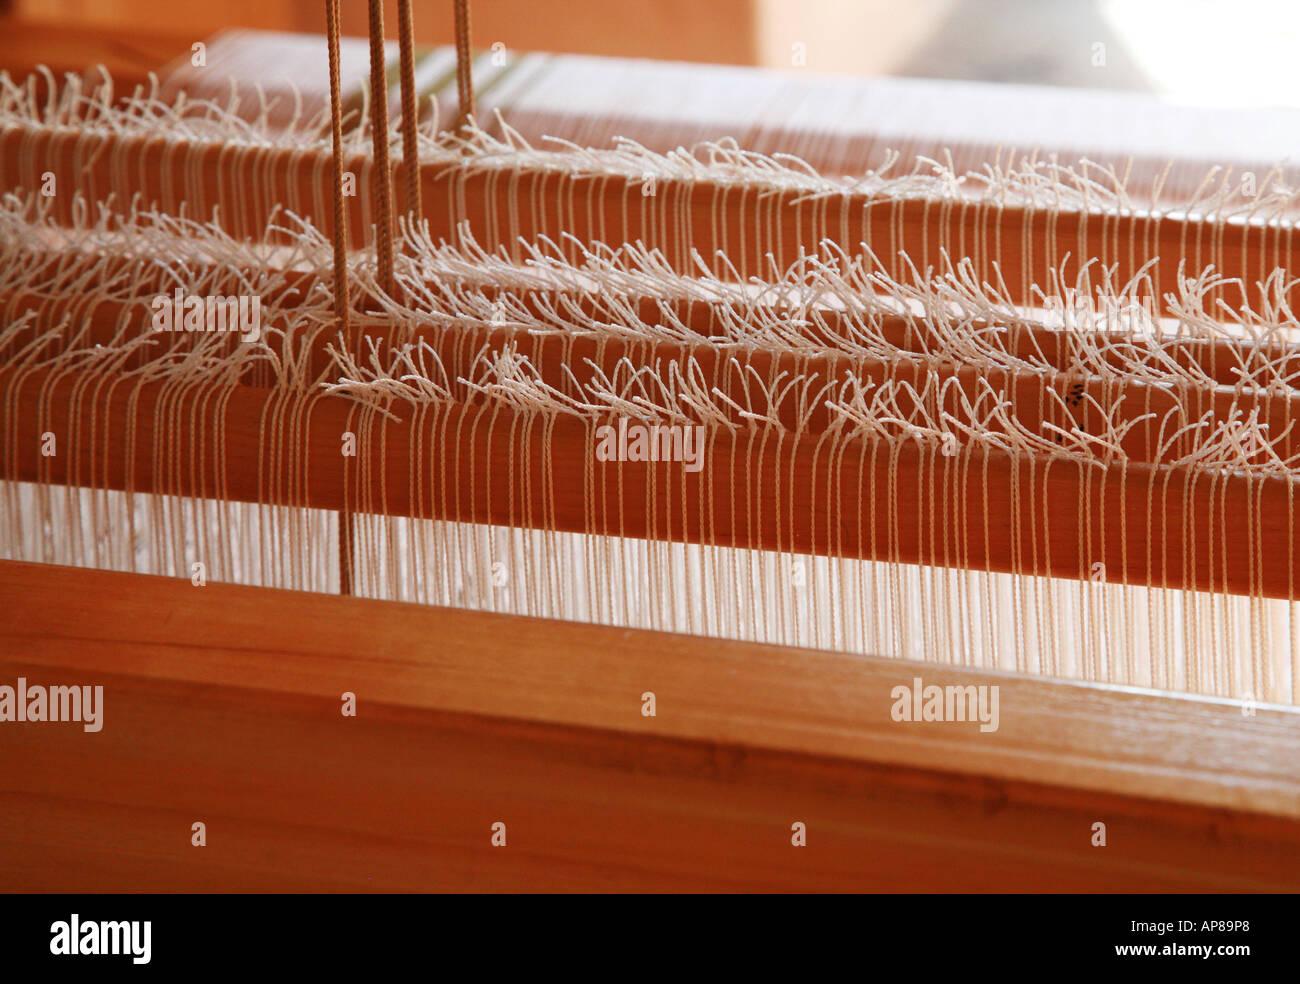 Warp knots on a weavers loom - Stock Image